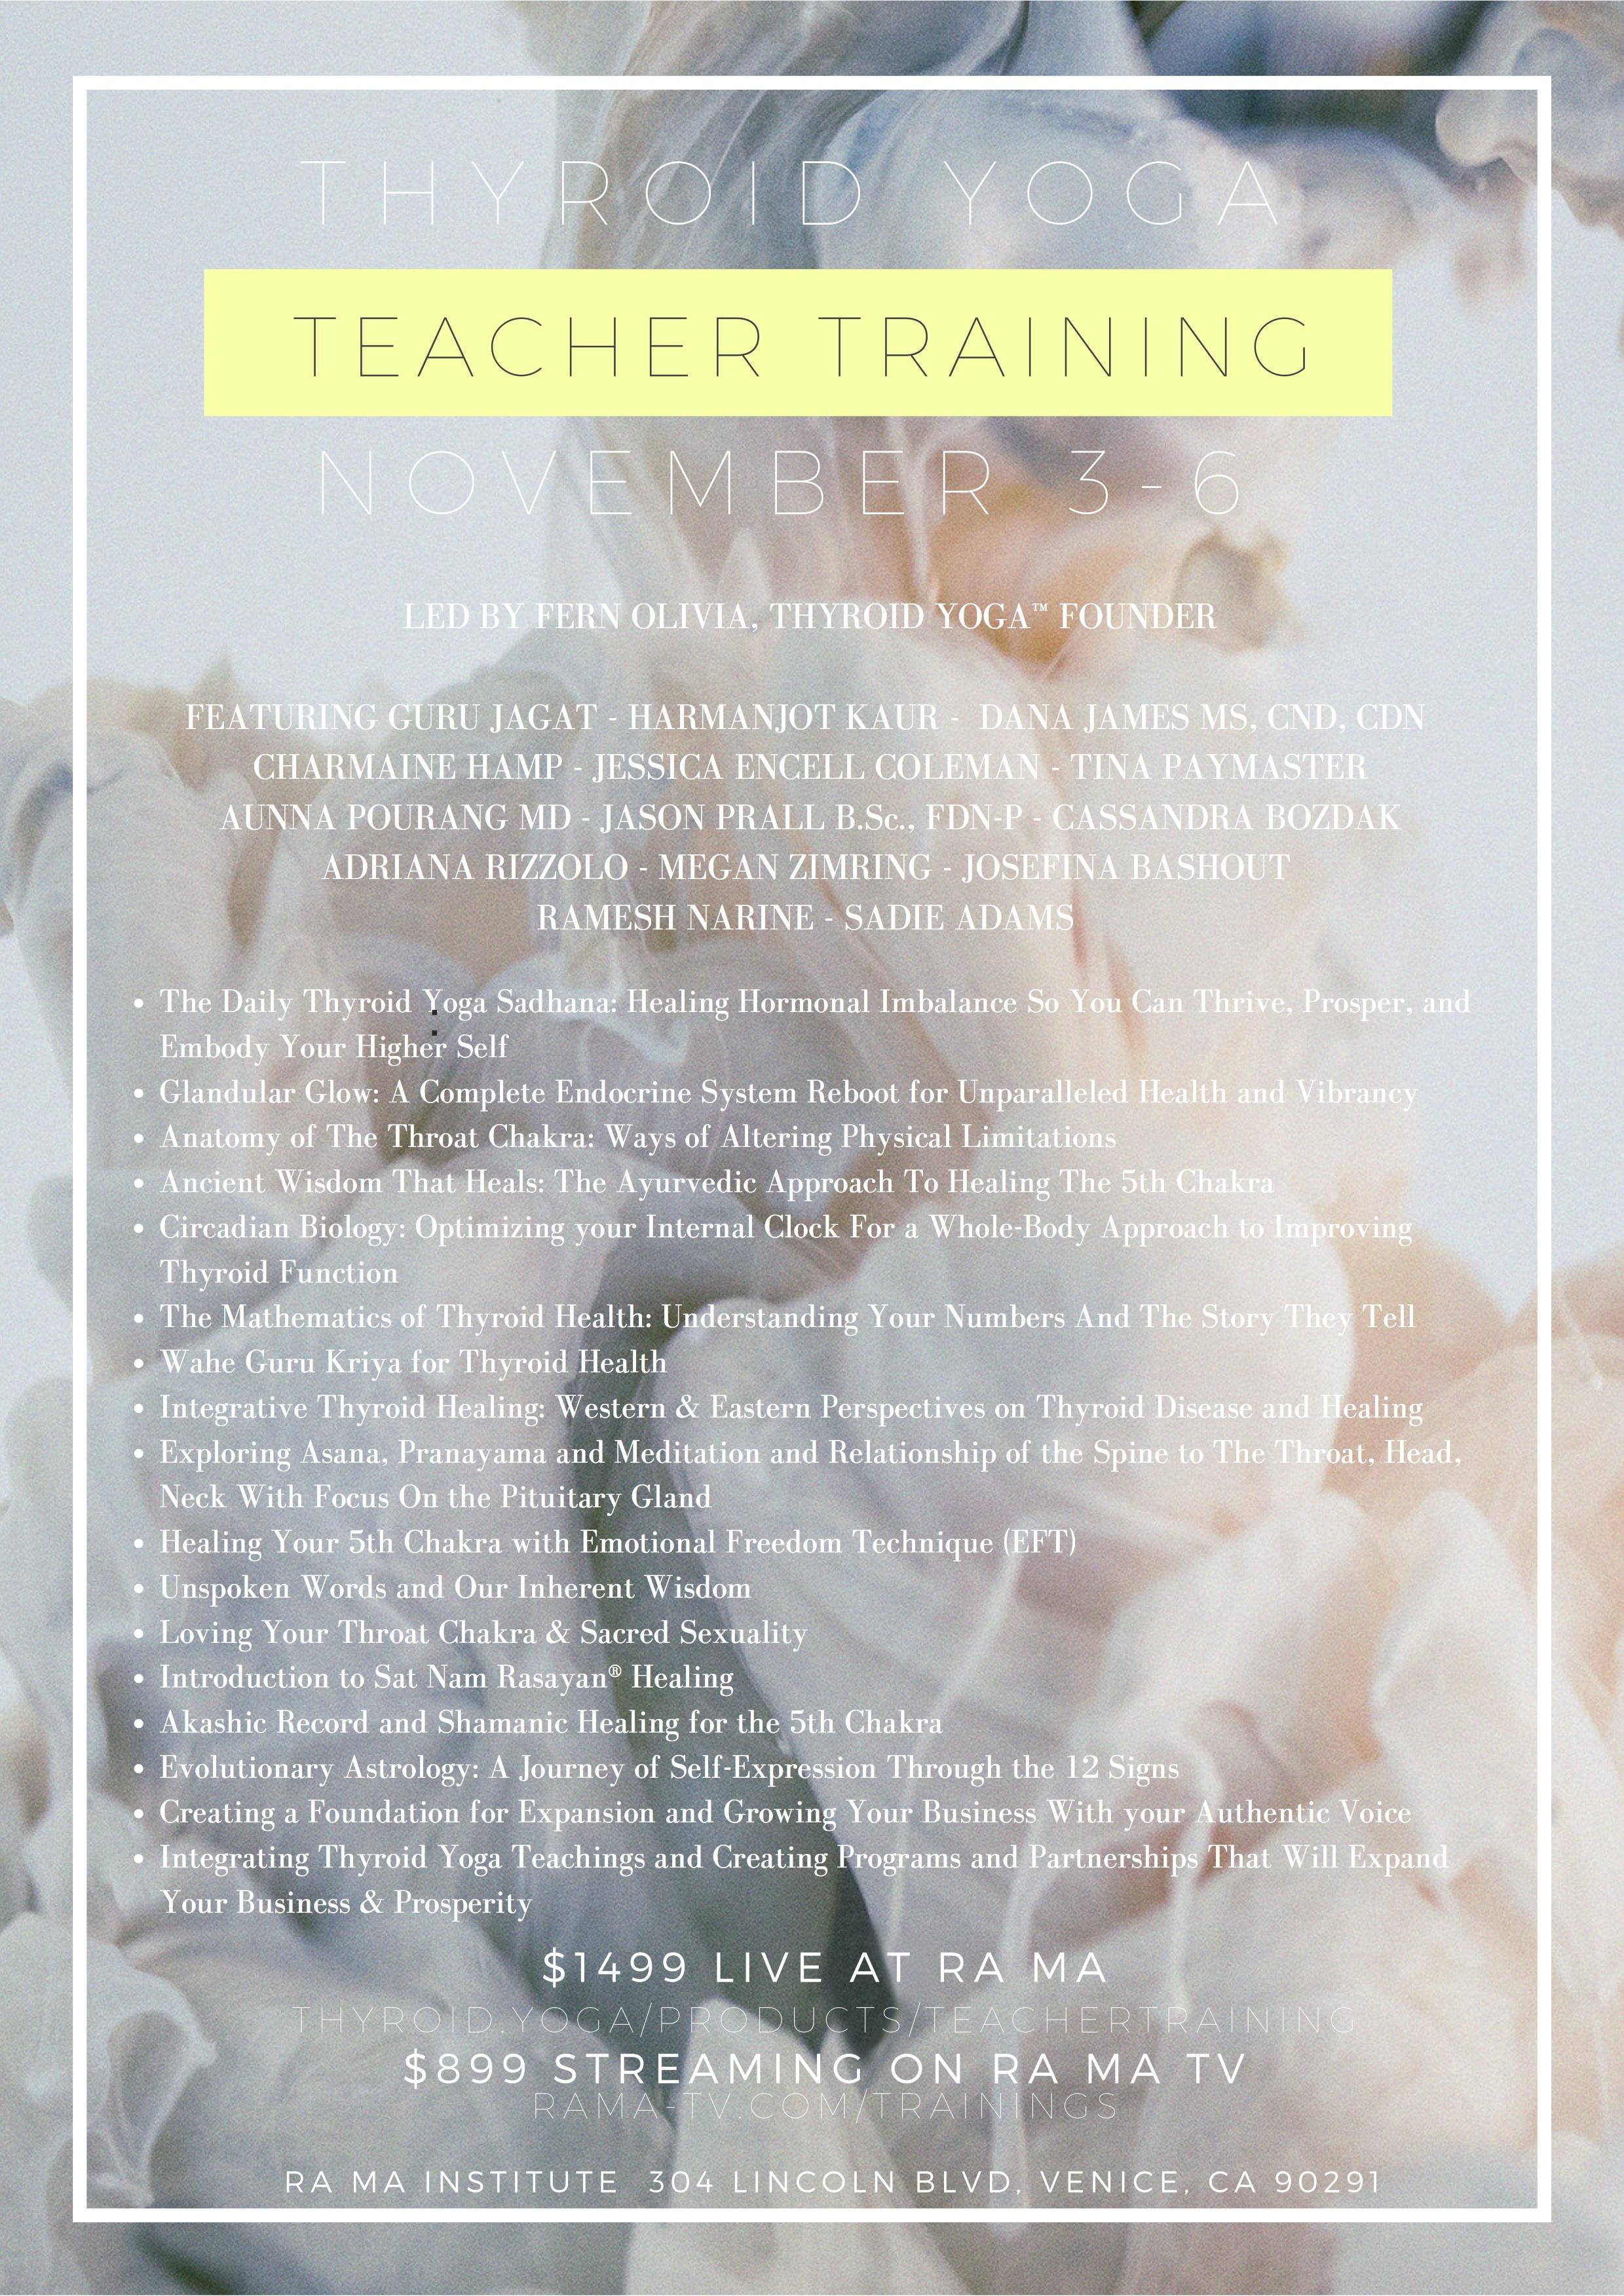 Thyroid Yoga Teacher Training with Fern Olivia